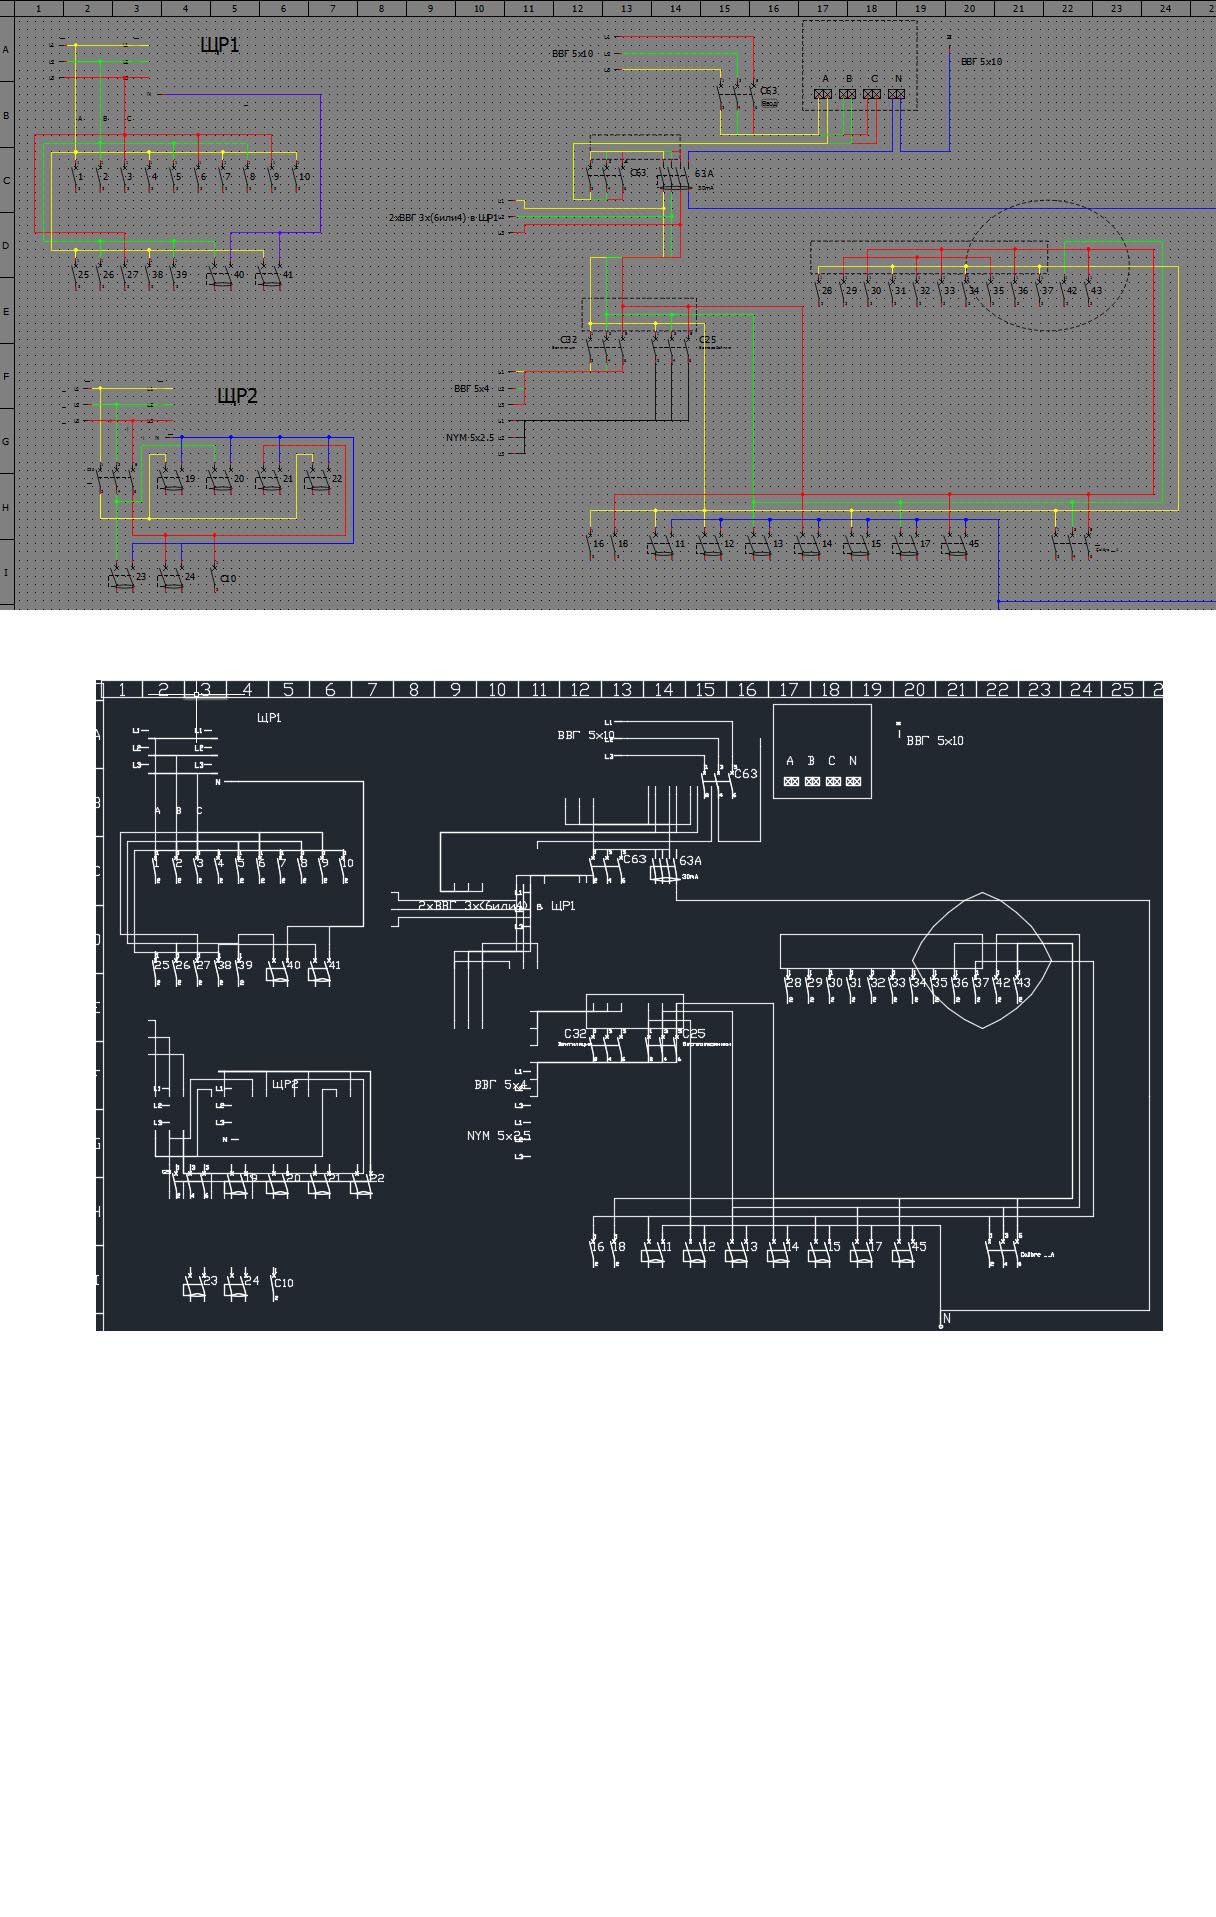 DXFExport.jpg, 486.62 kb, 1216 x 1917